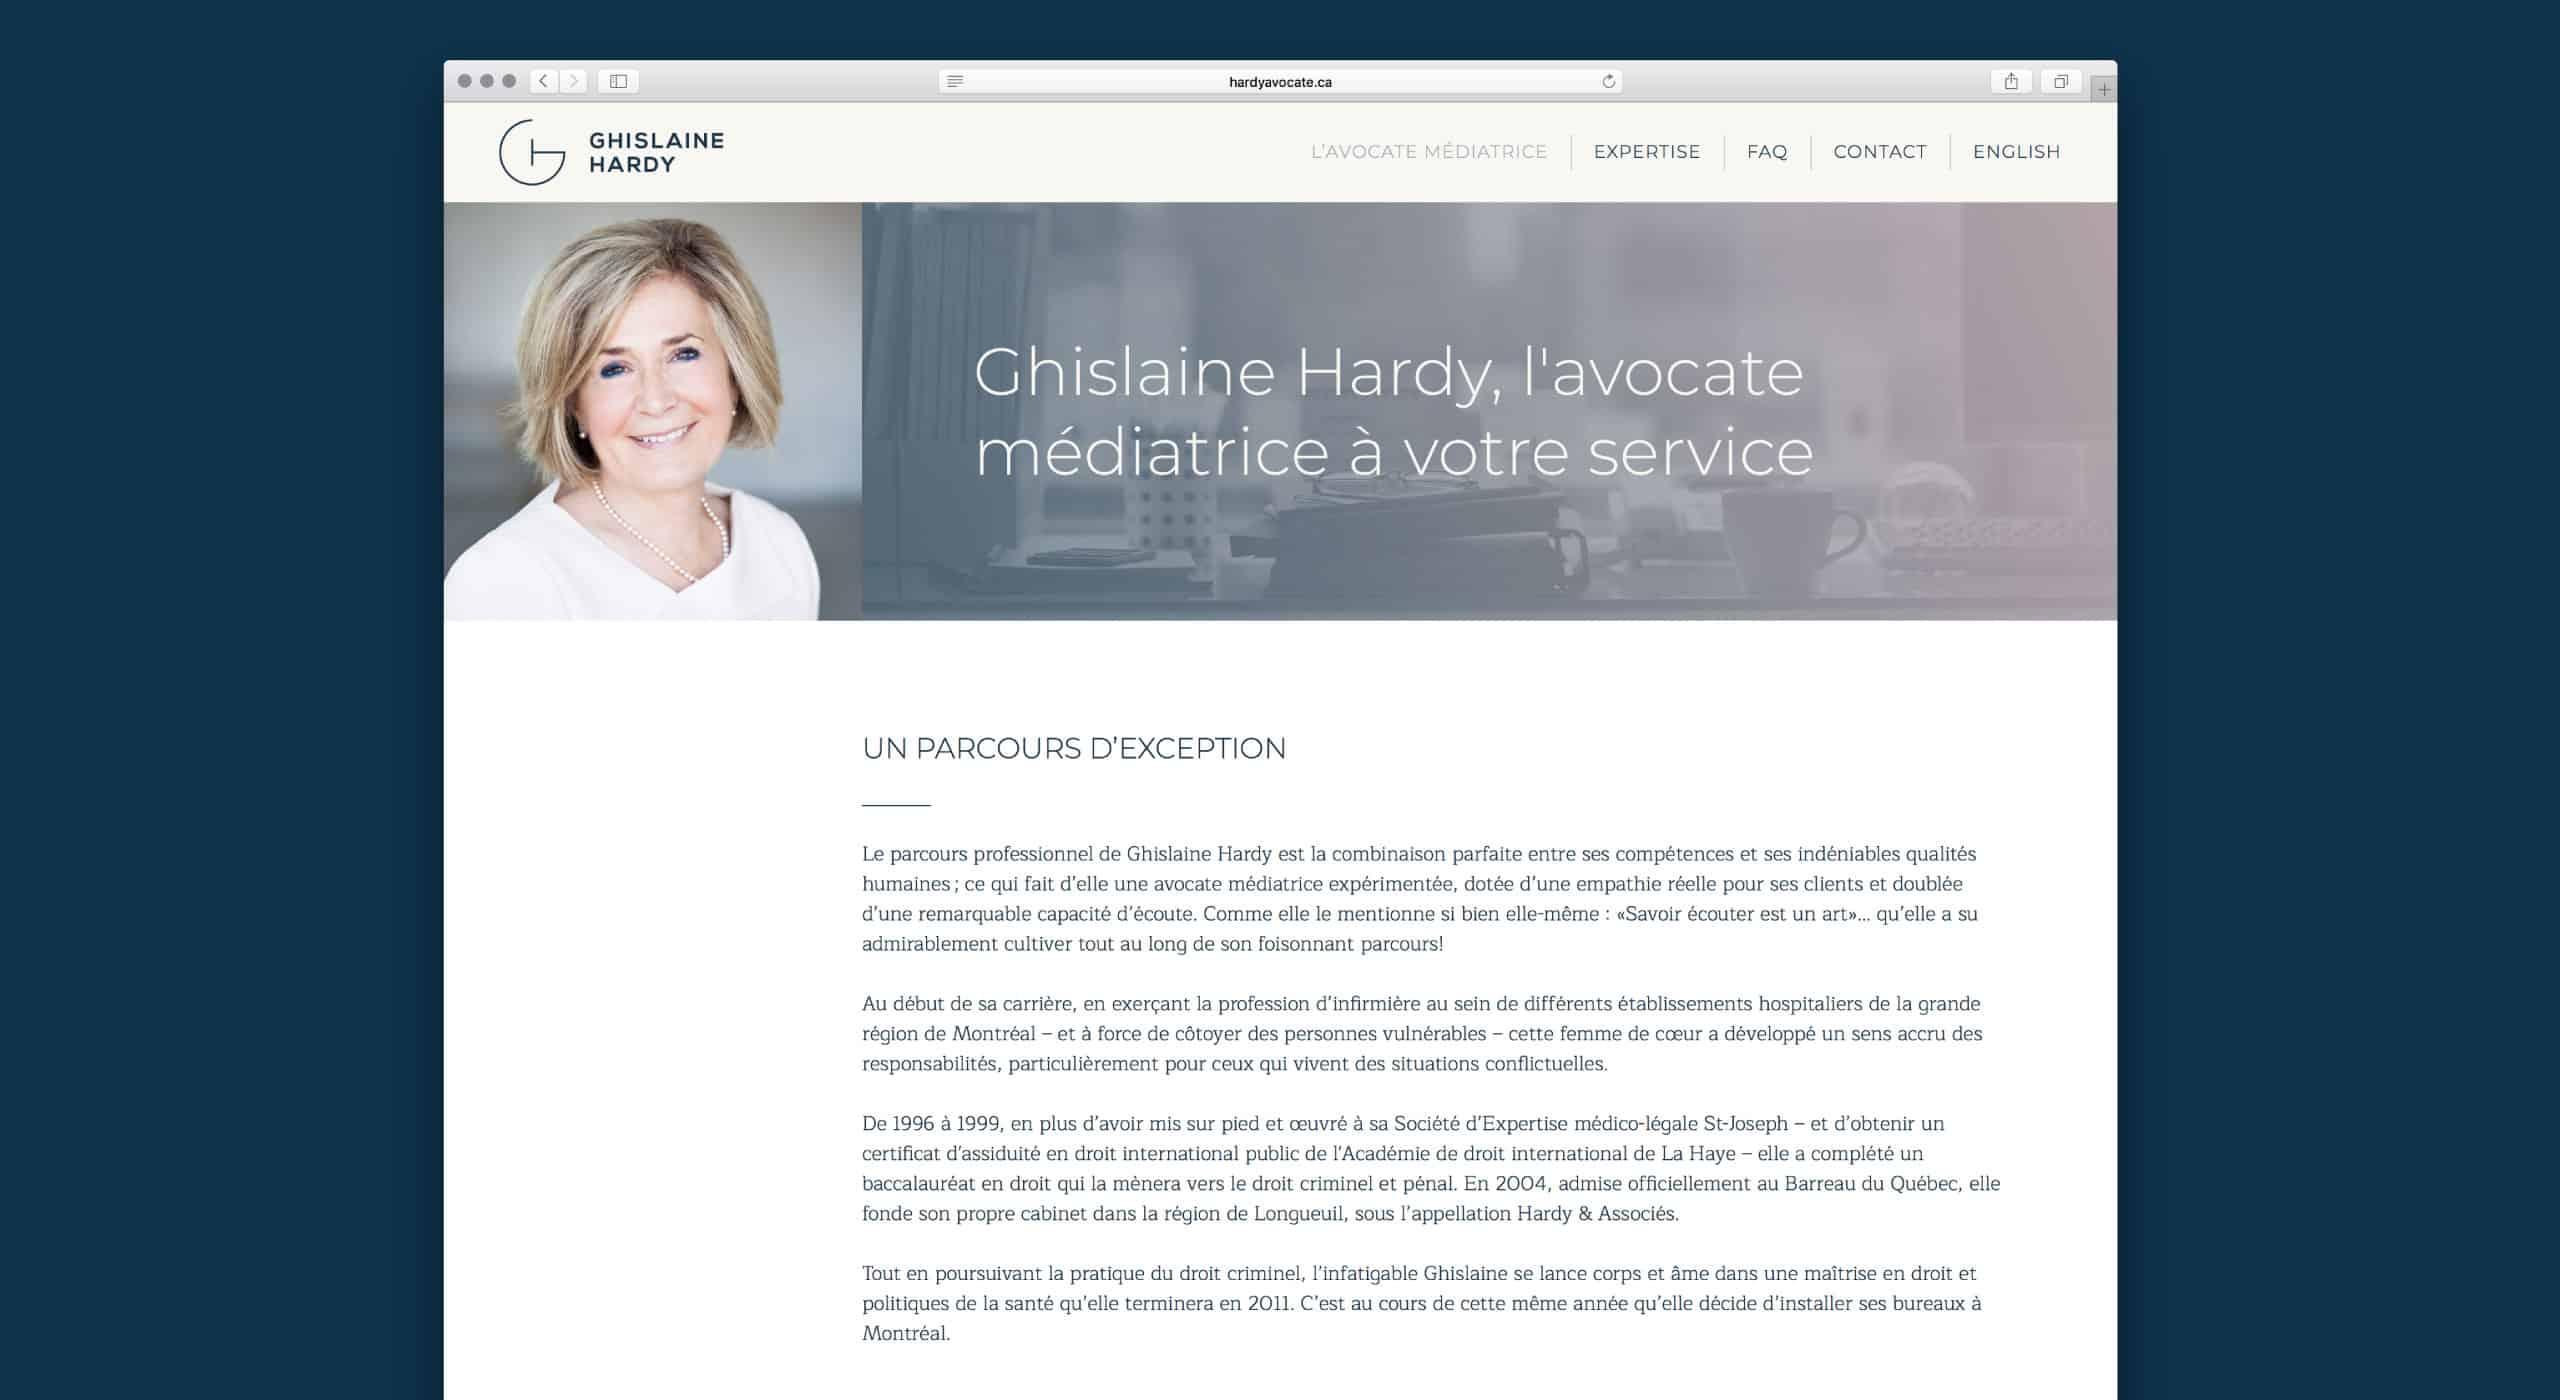 MlleRouge_GhislaineHardy_Montage_Identite_SiteWeb2